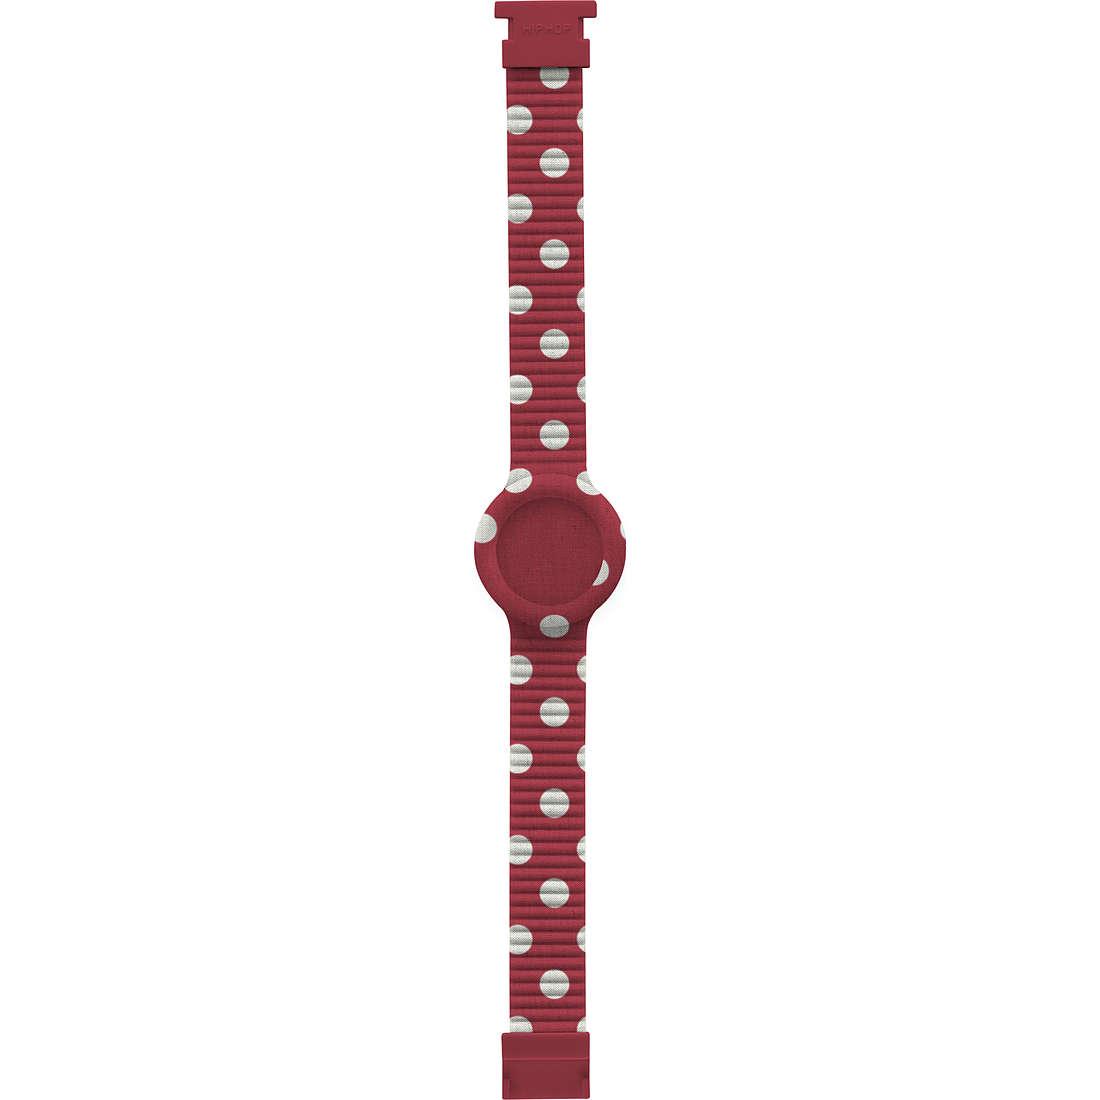 orologio accessorio donna Hip Hop Pois HBU0419